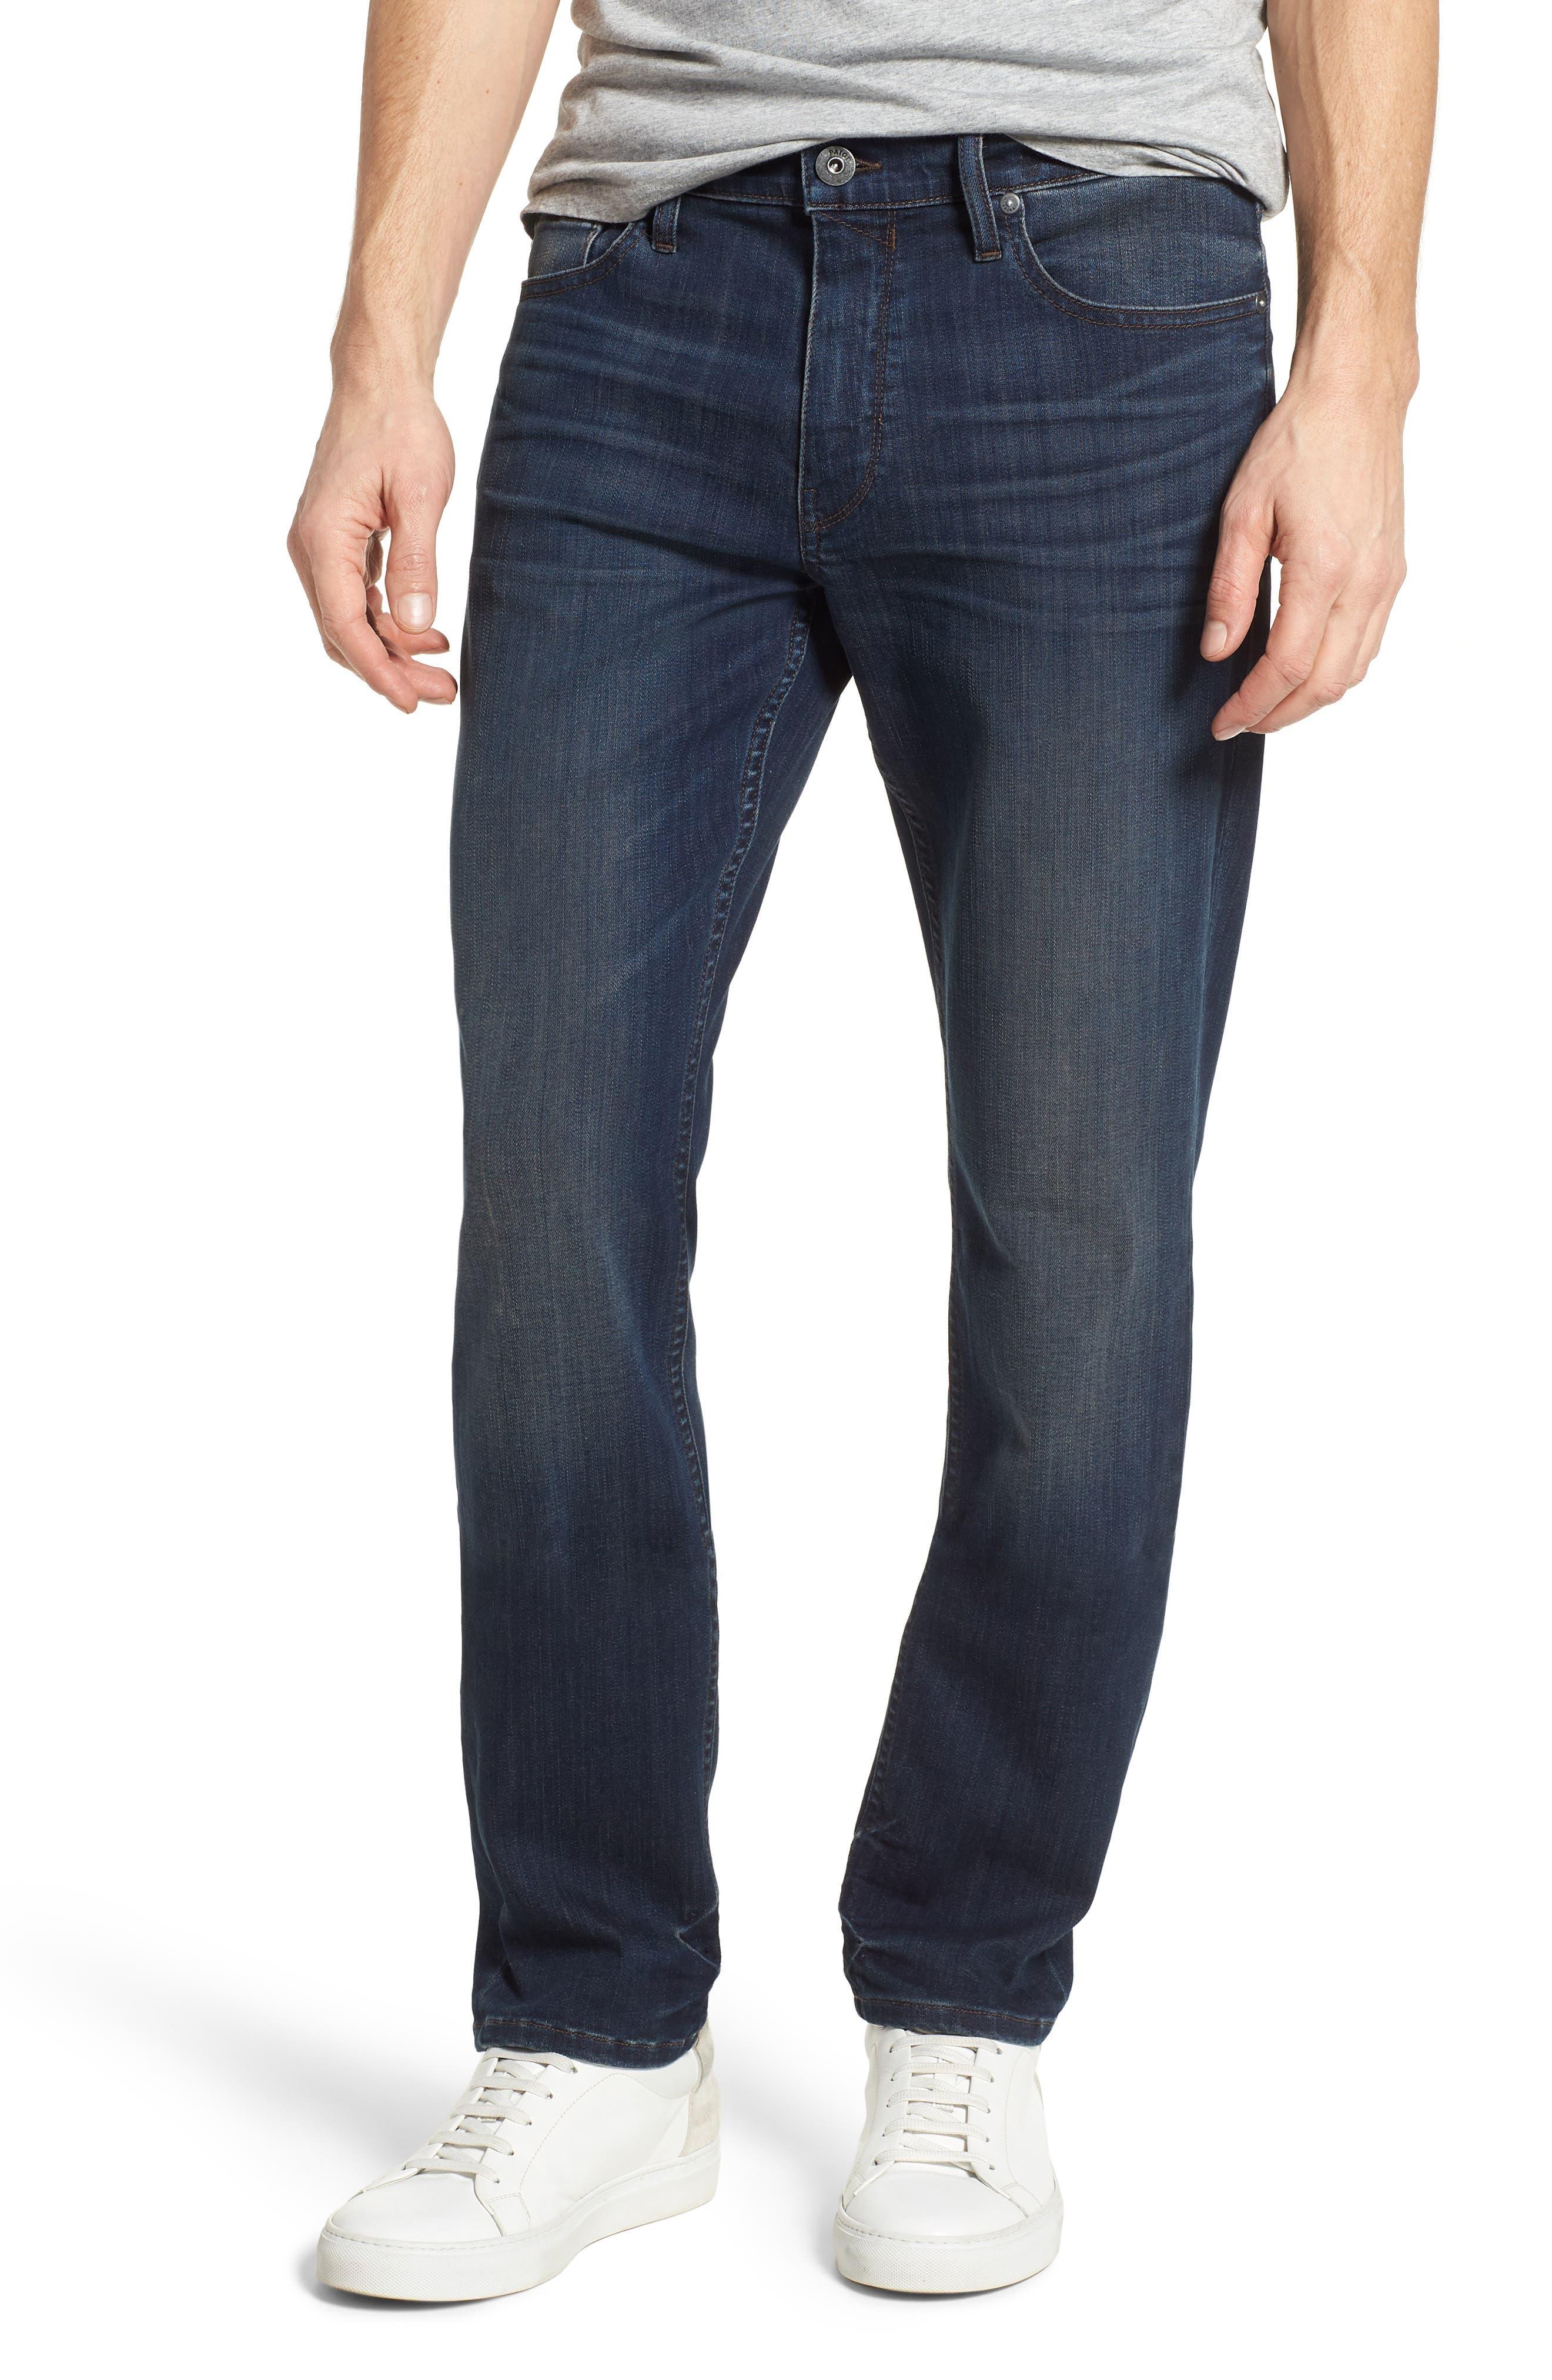 Transcend - Lennox Slim Fit Jeans,                             Main thumbnail 1, color,                             Freeman